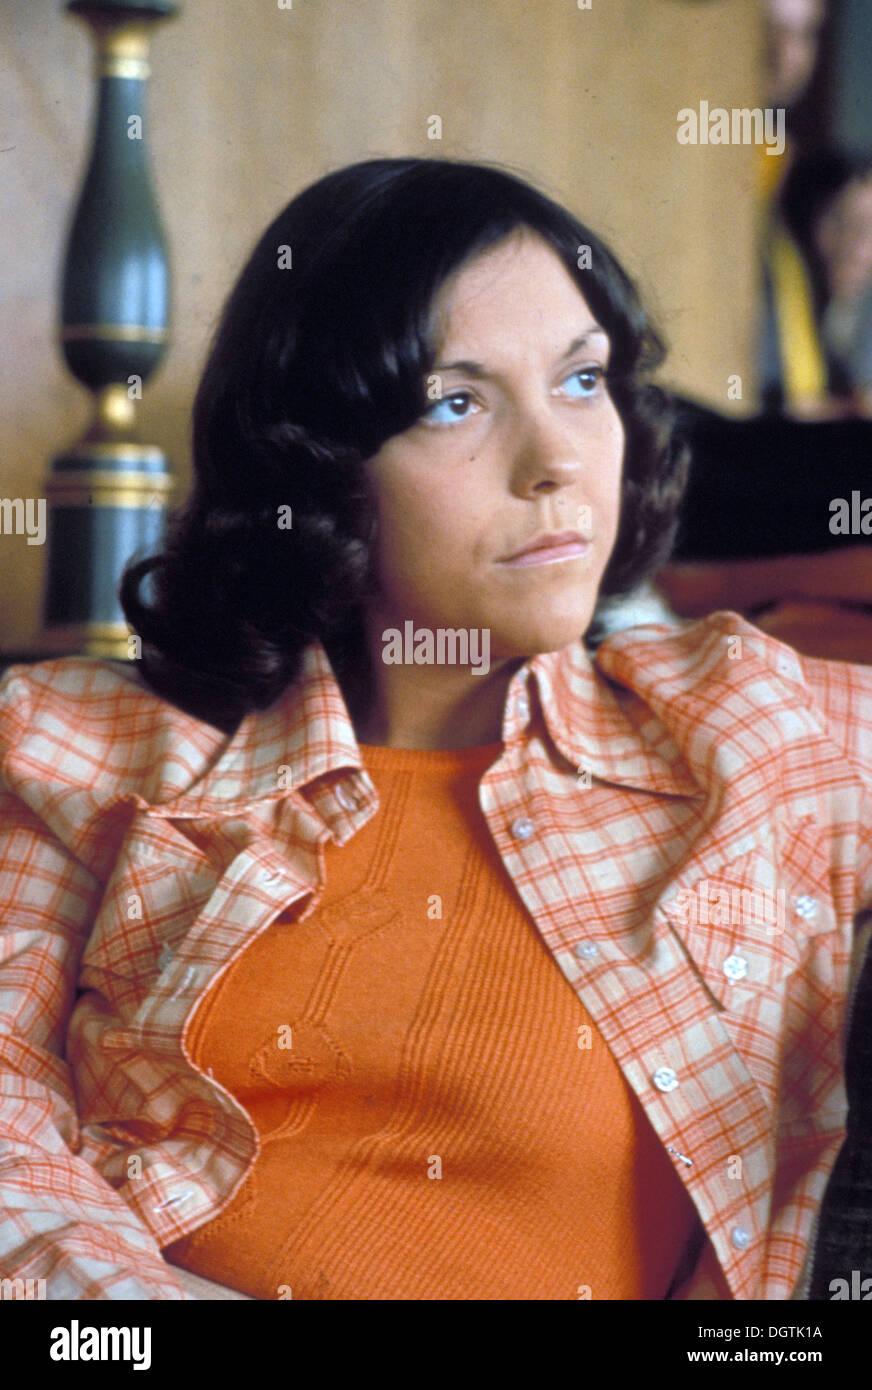 https://c8.alamy.com/comp/DGTK1A/karen-carpenter-1950-1983-american-singer-about-1976-photo-laurens-DGTK1A.jpg